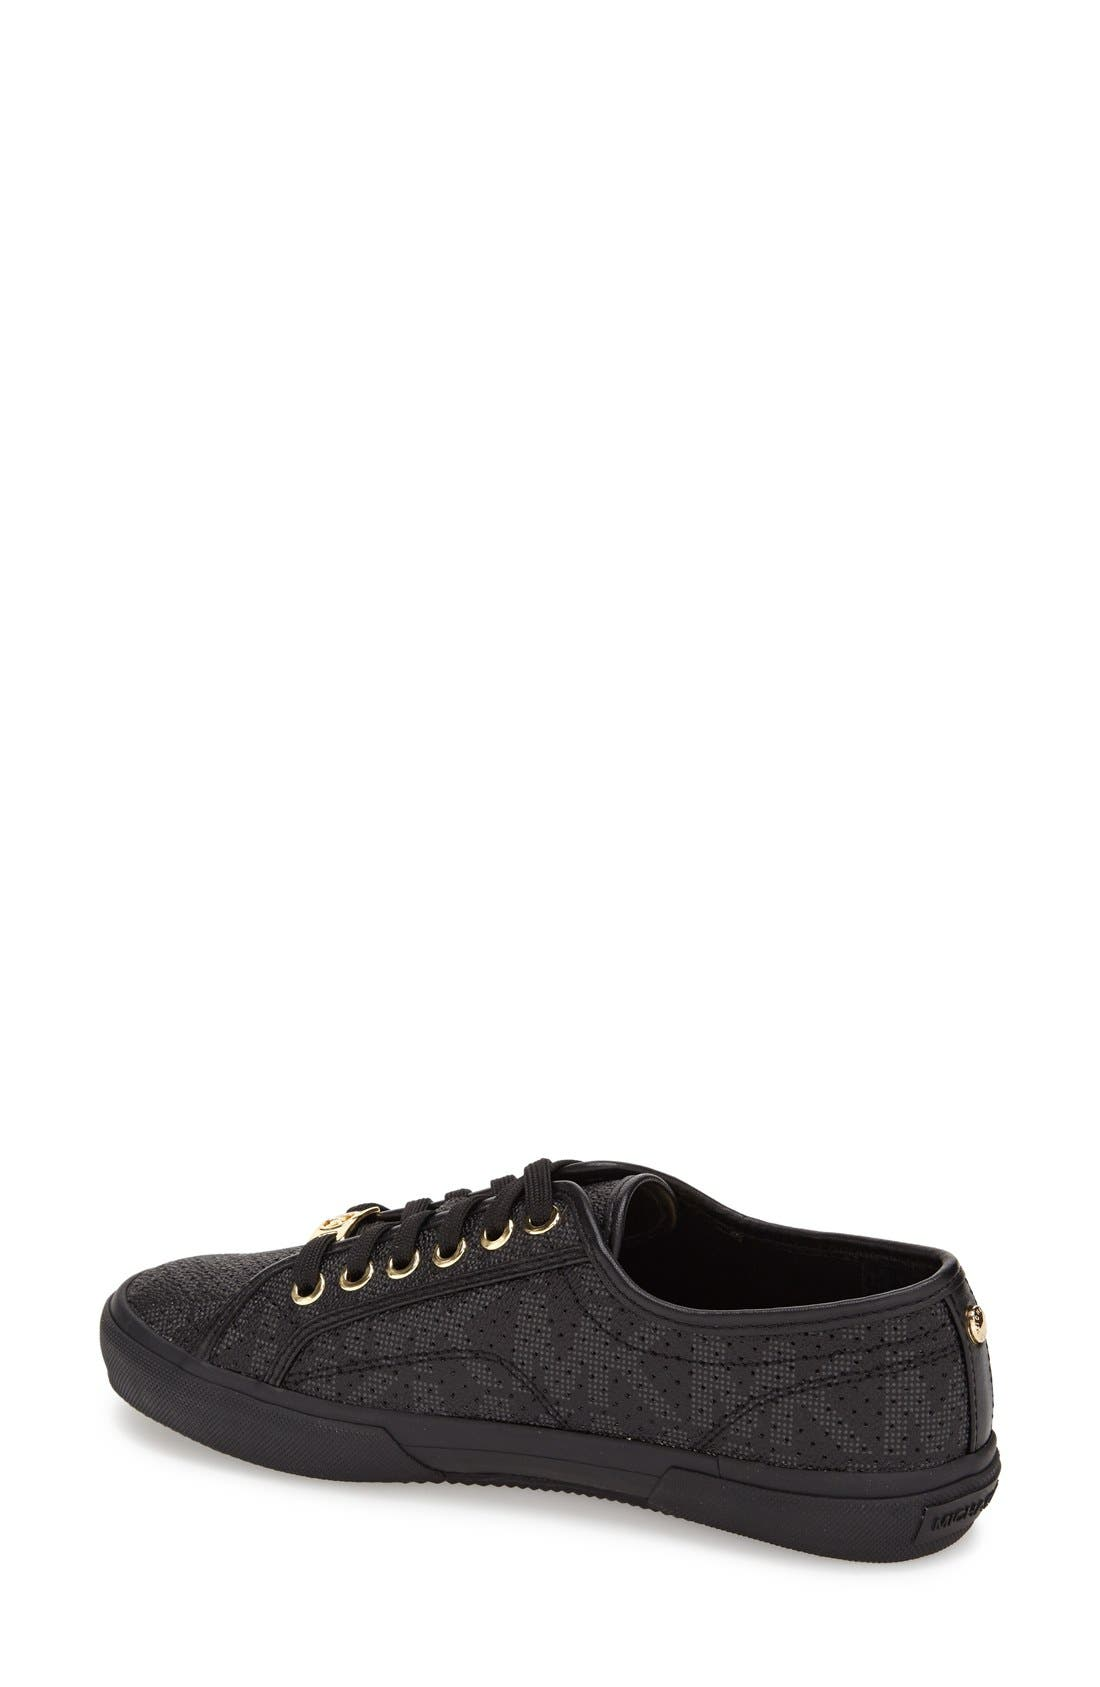 'Boerum' Sneaker,                             Alternate thumbnail 2, color,                             001